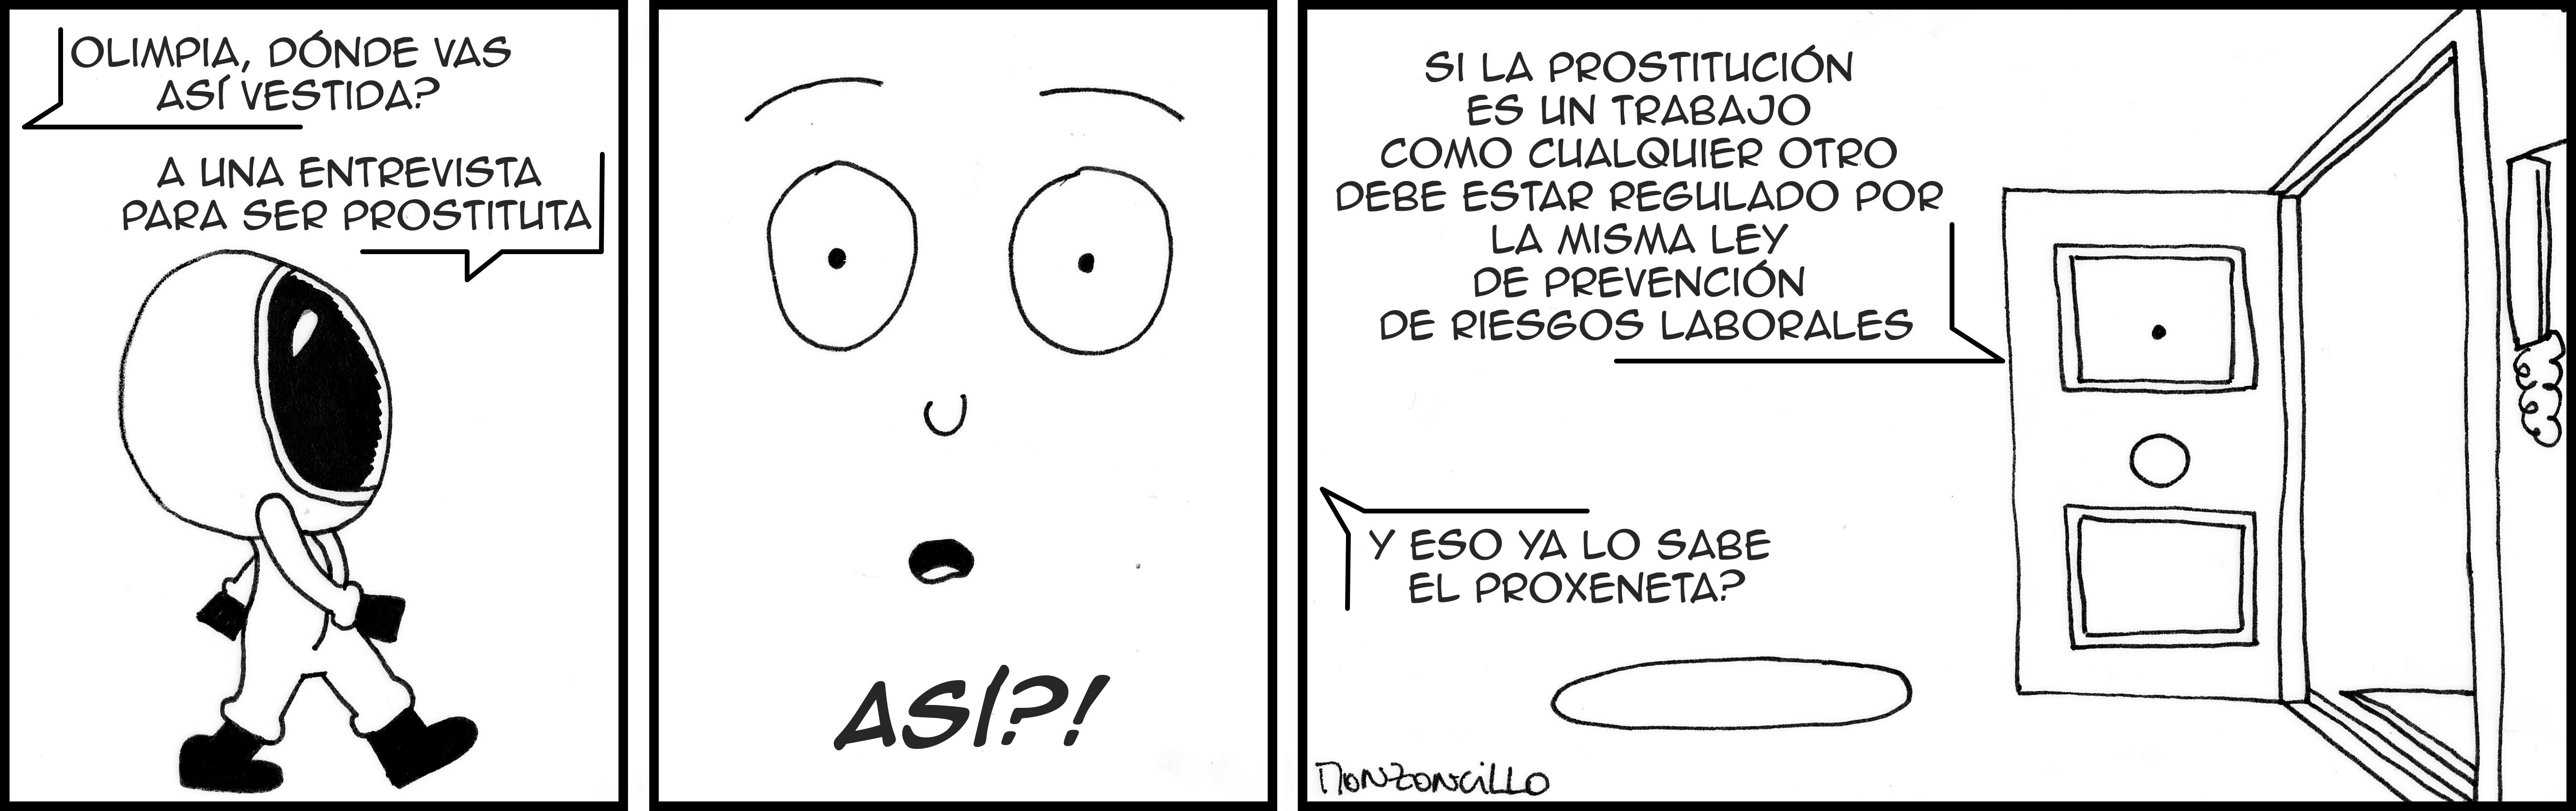 Feminismo, prostitución